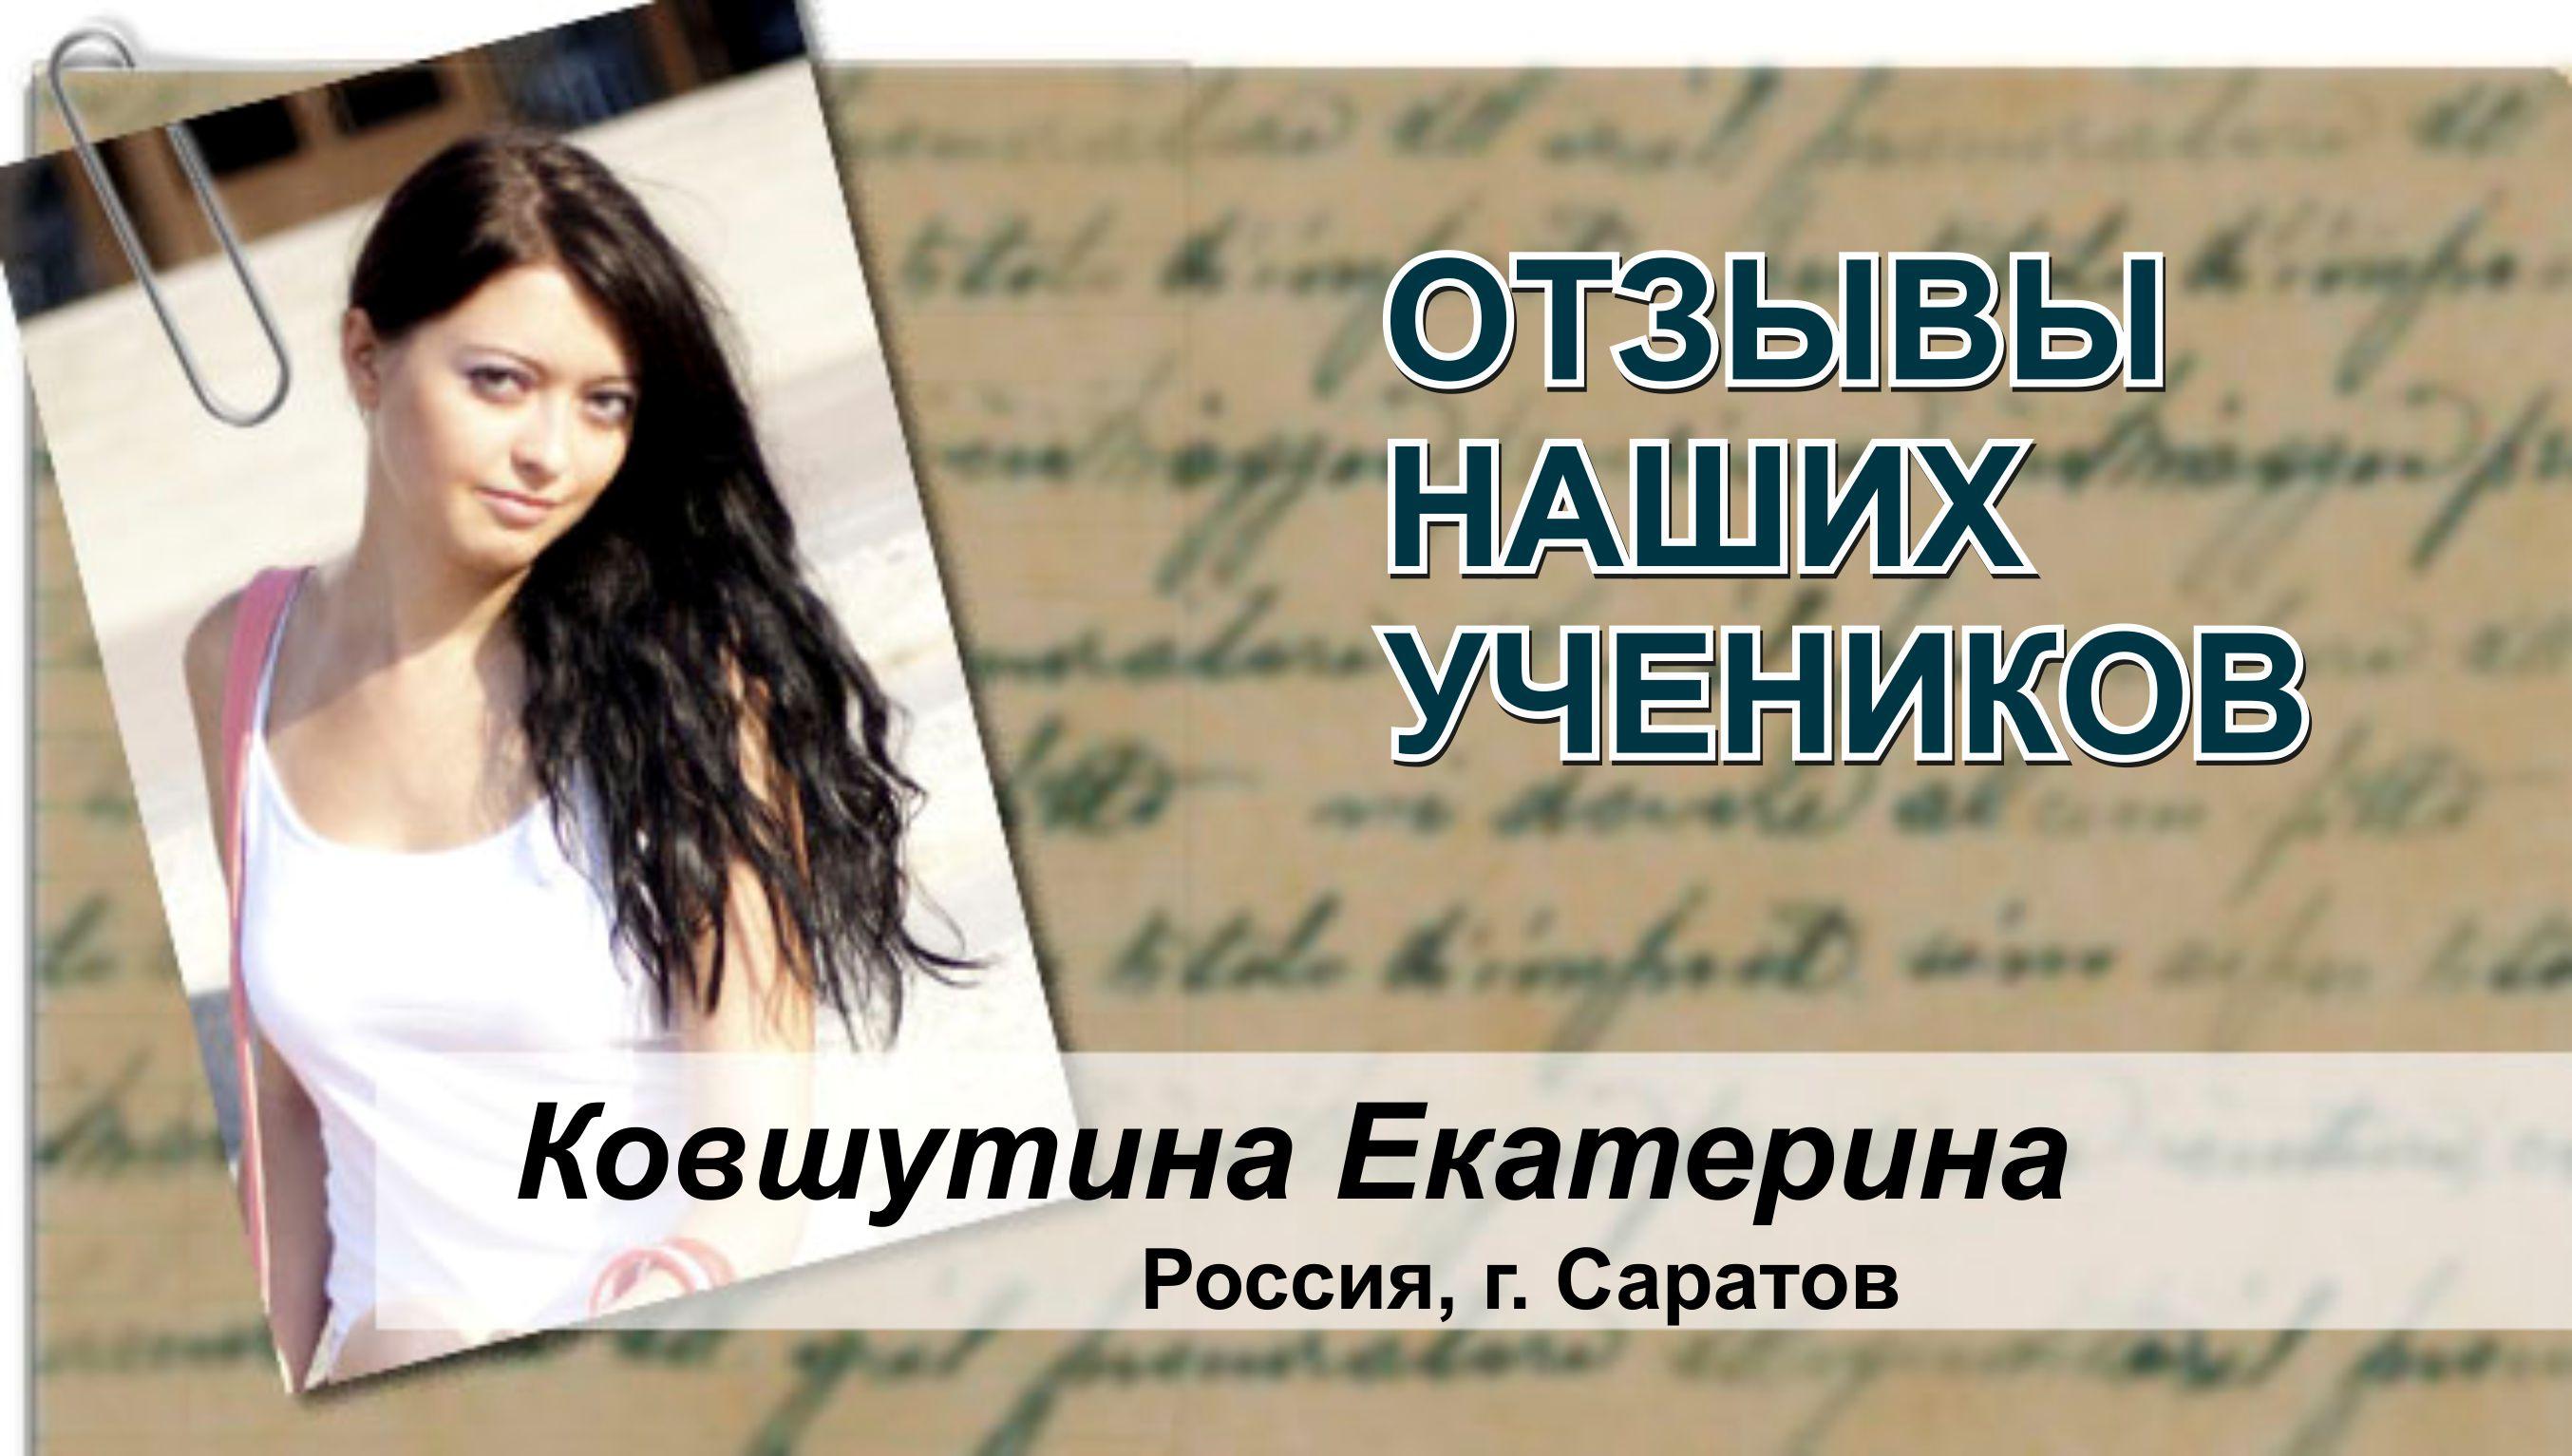 Ковтушина Екатерина отзыв ЭМСА